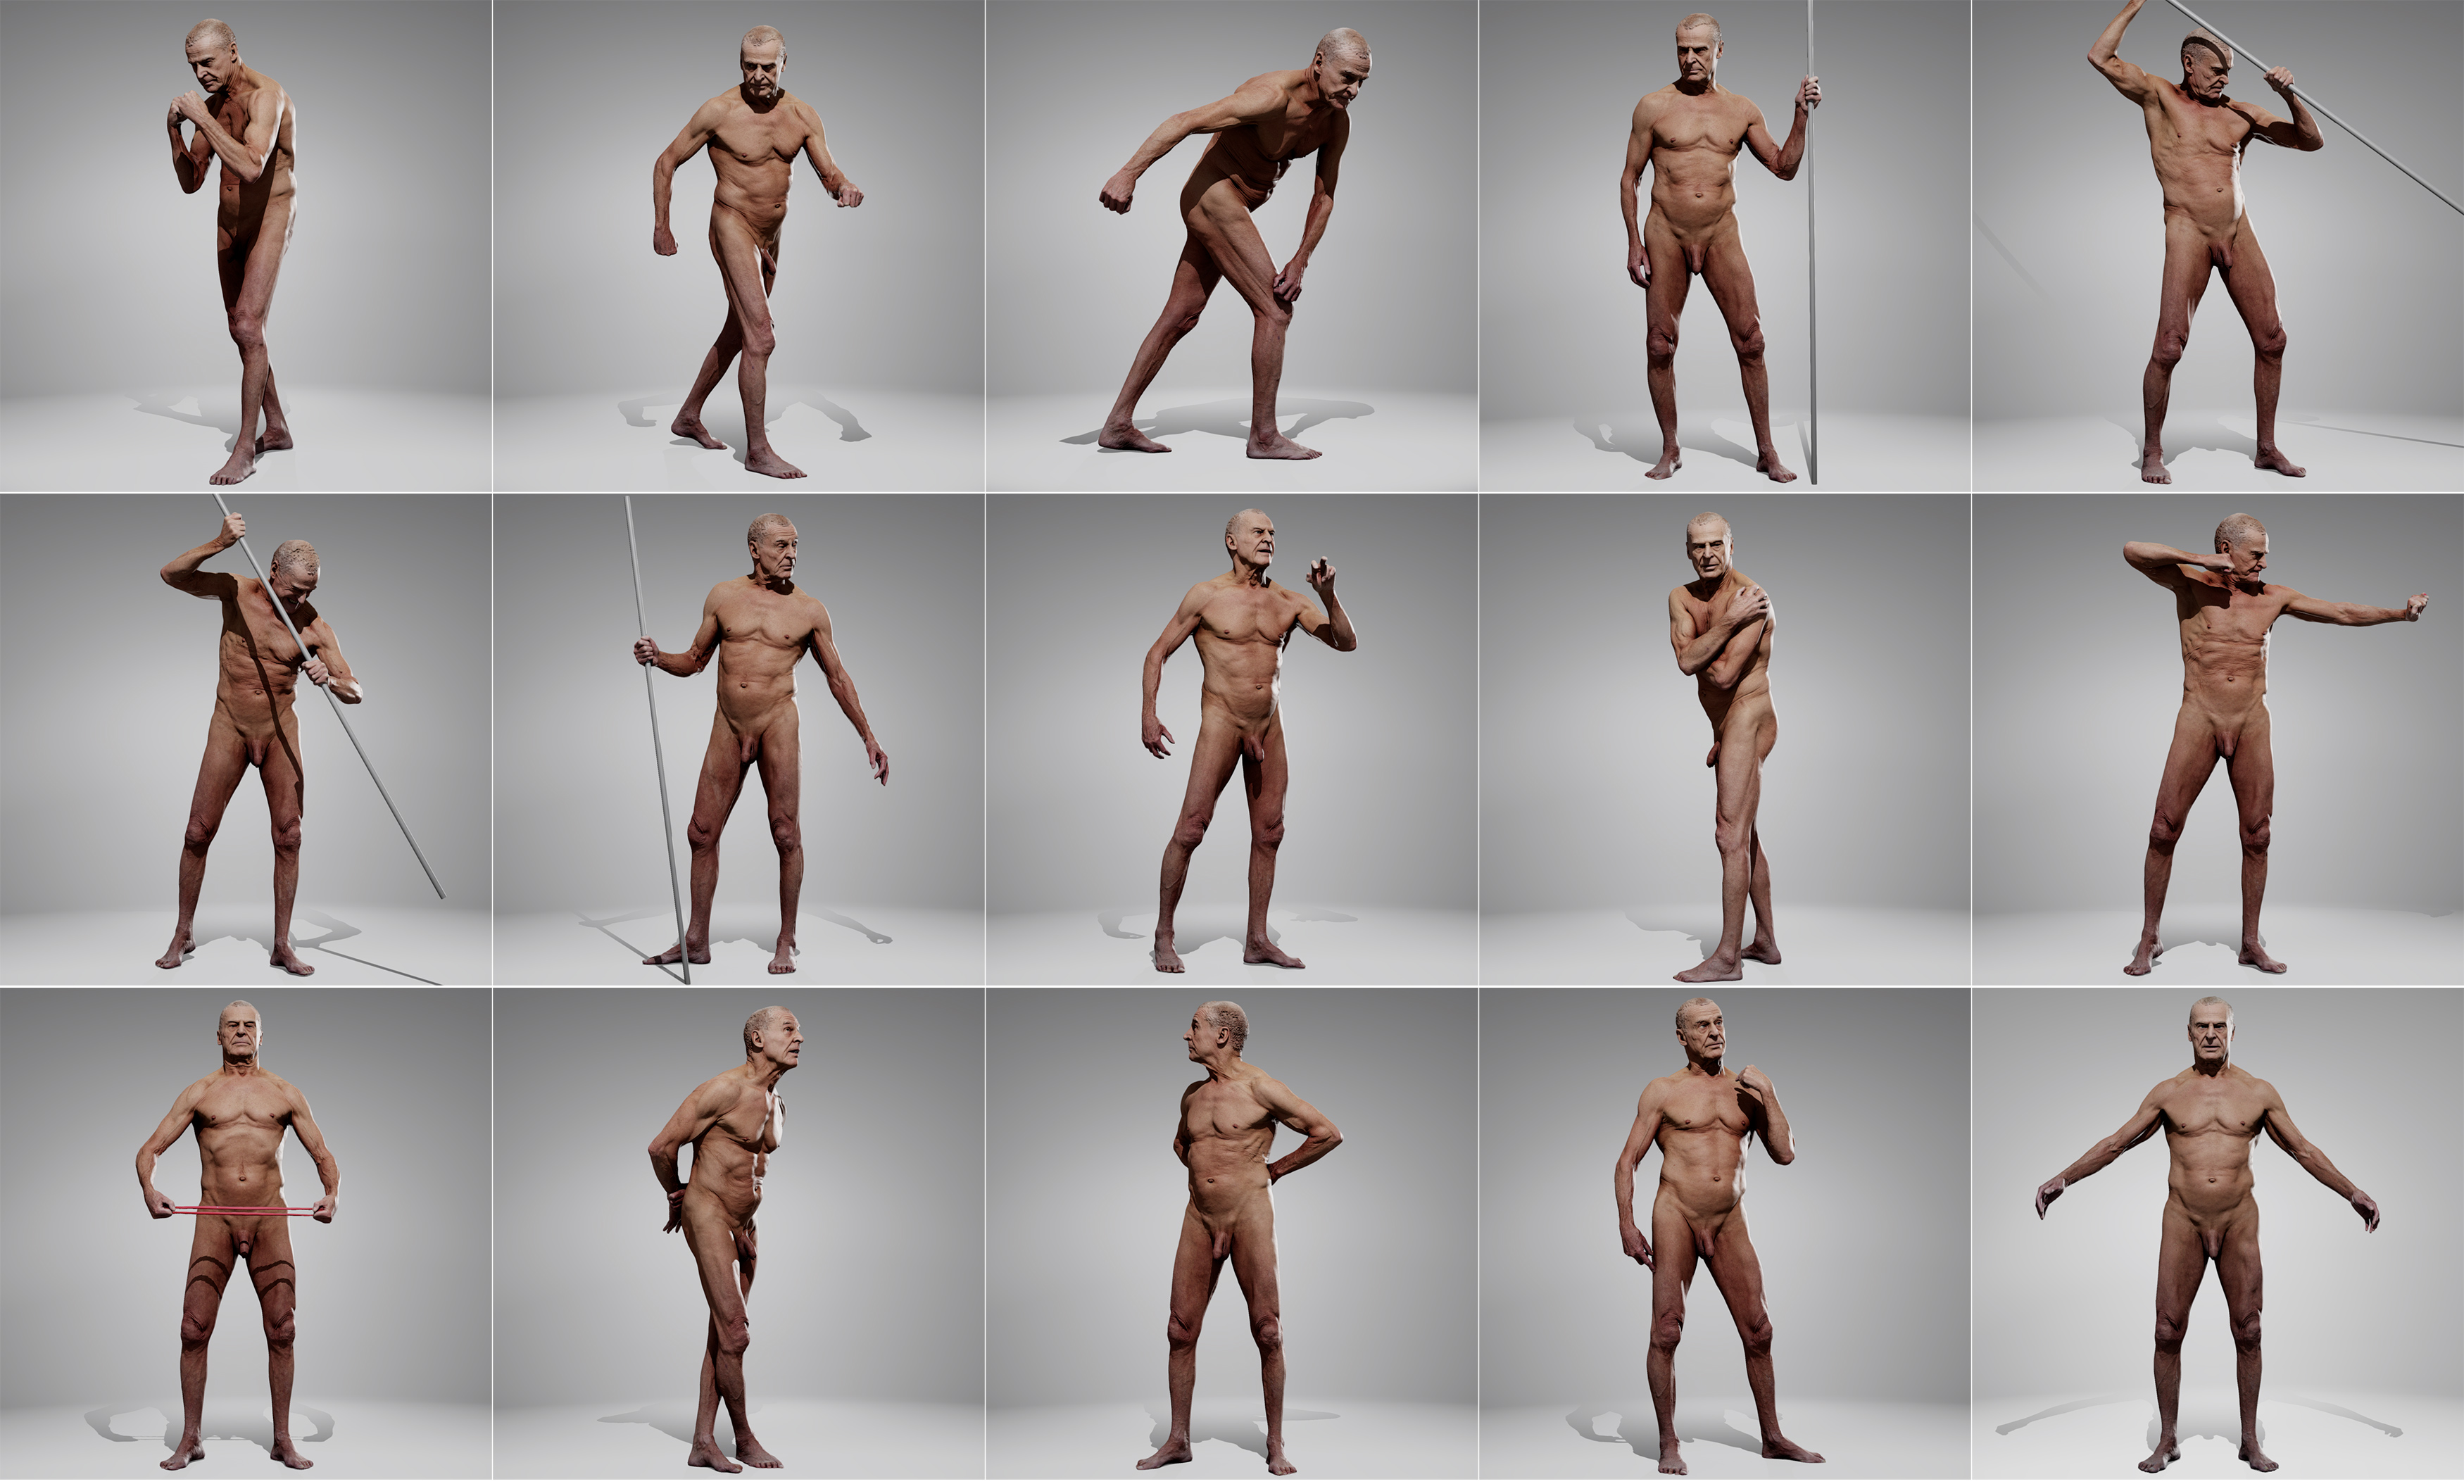 Male 02 Pose Pack - Anatomy 360-5395